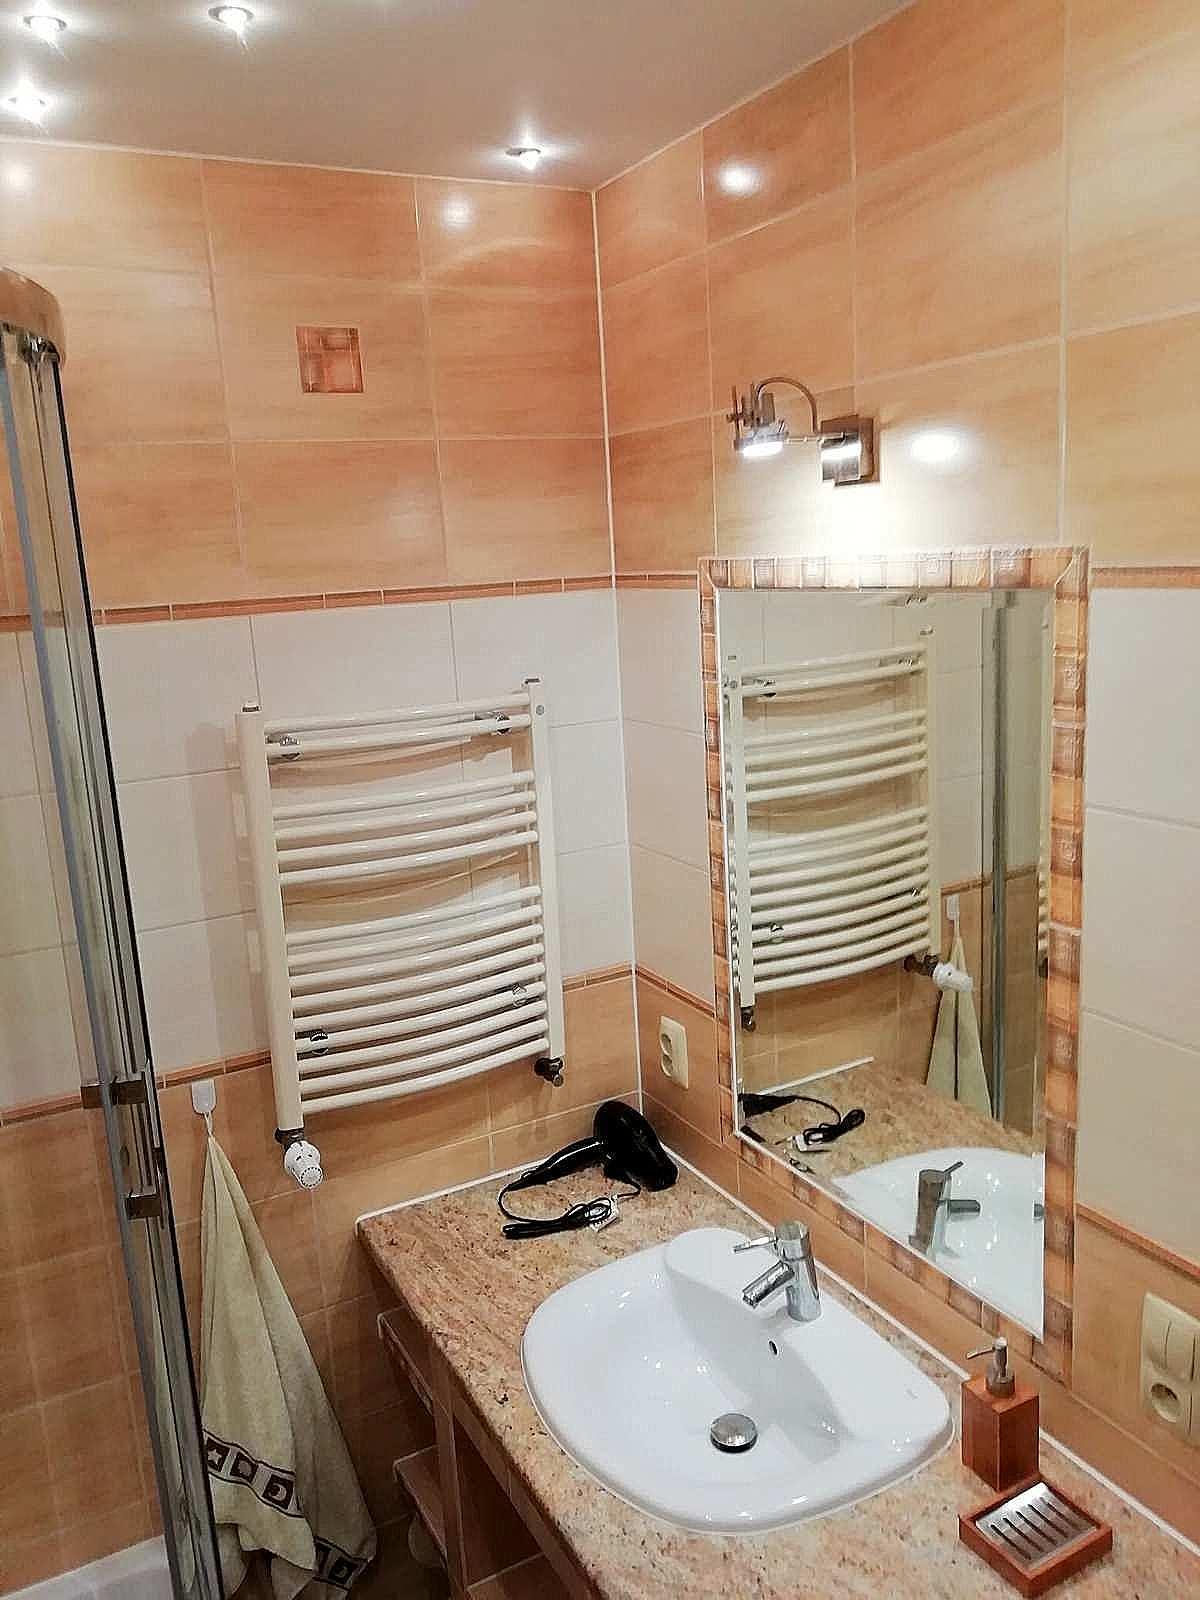 łazienka apartamentu fabryka endorfin w kłodzku/bathroom in apartment Fabryka Endorfin Klodzko